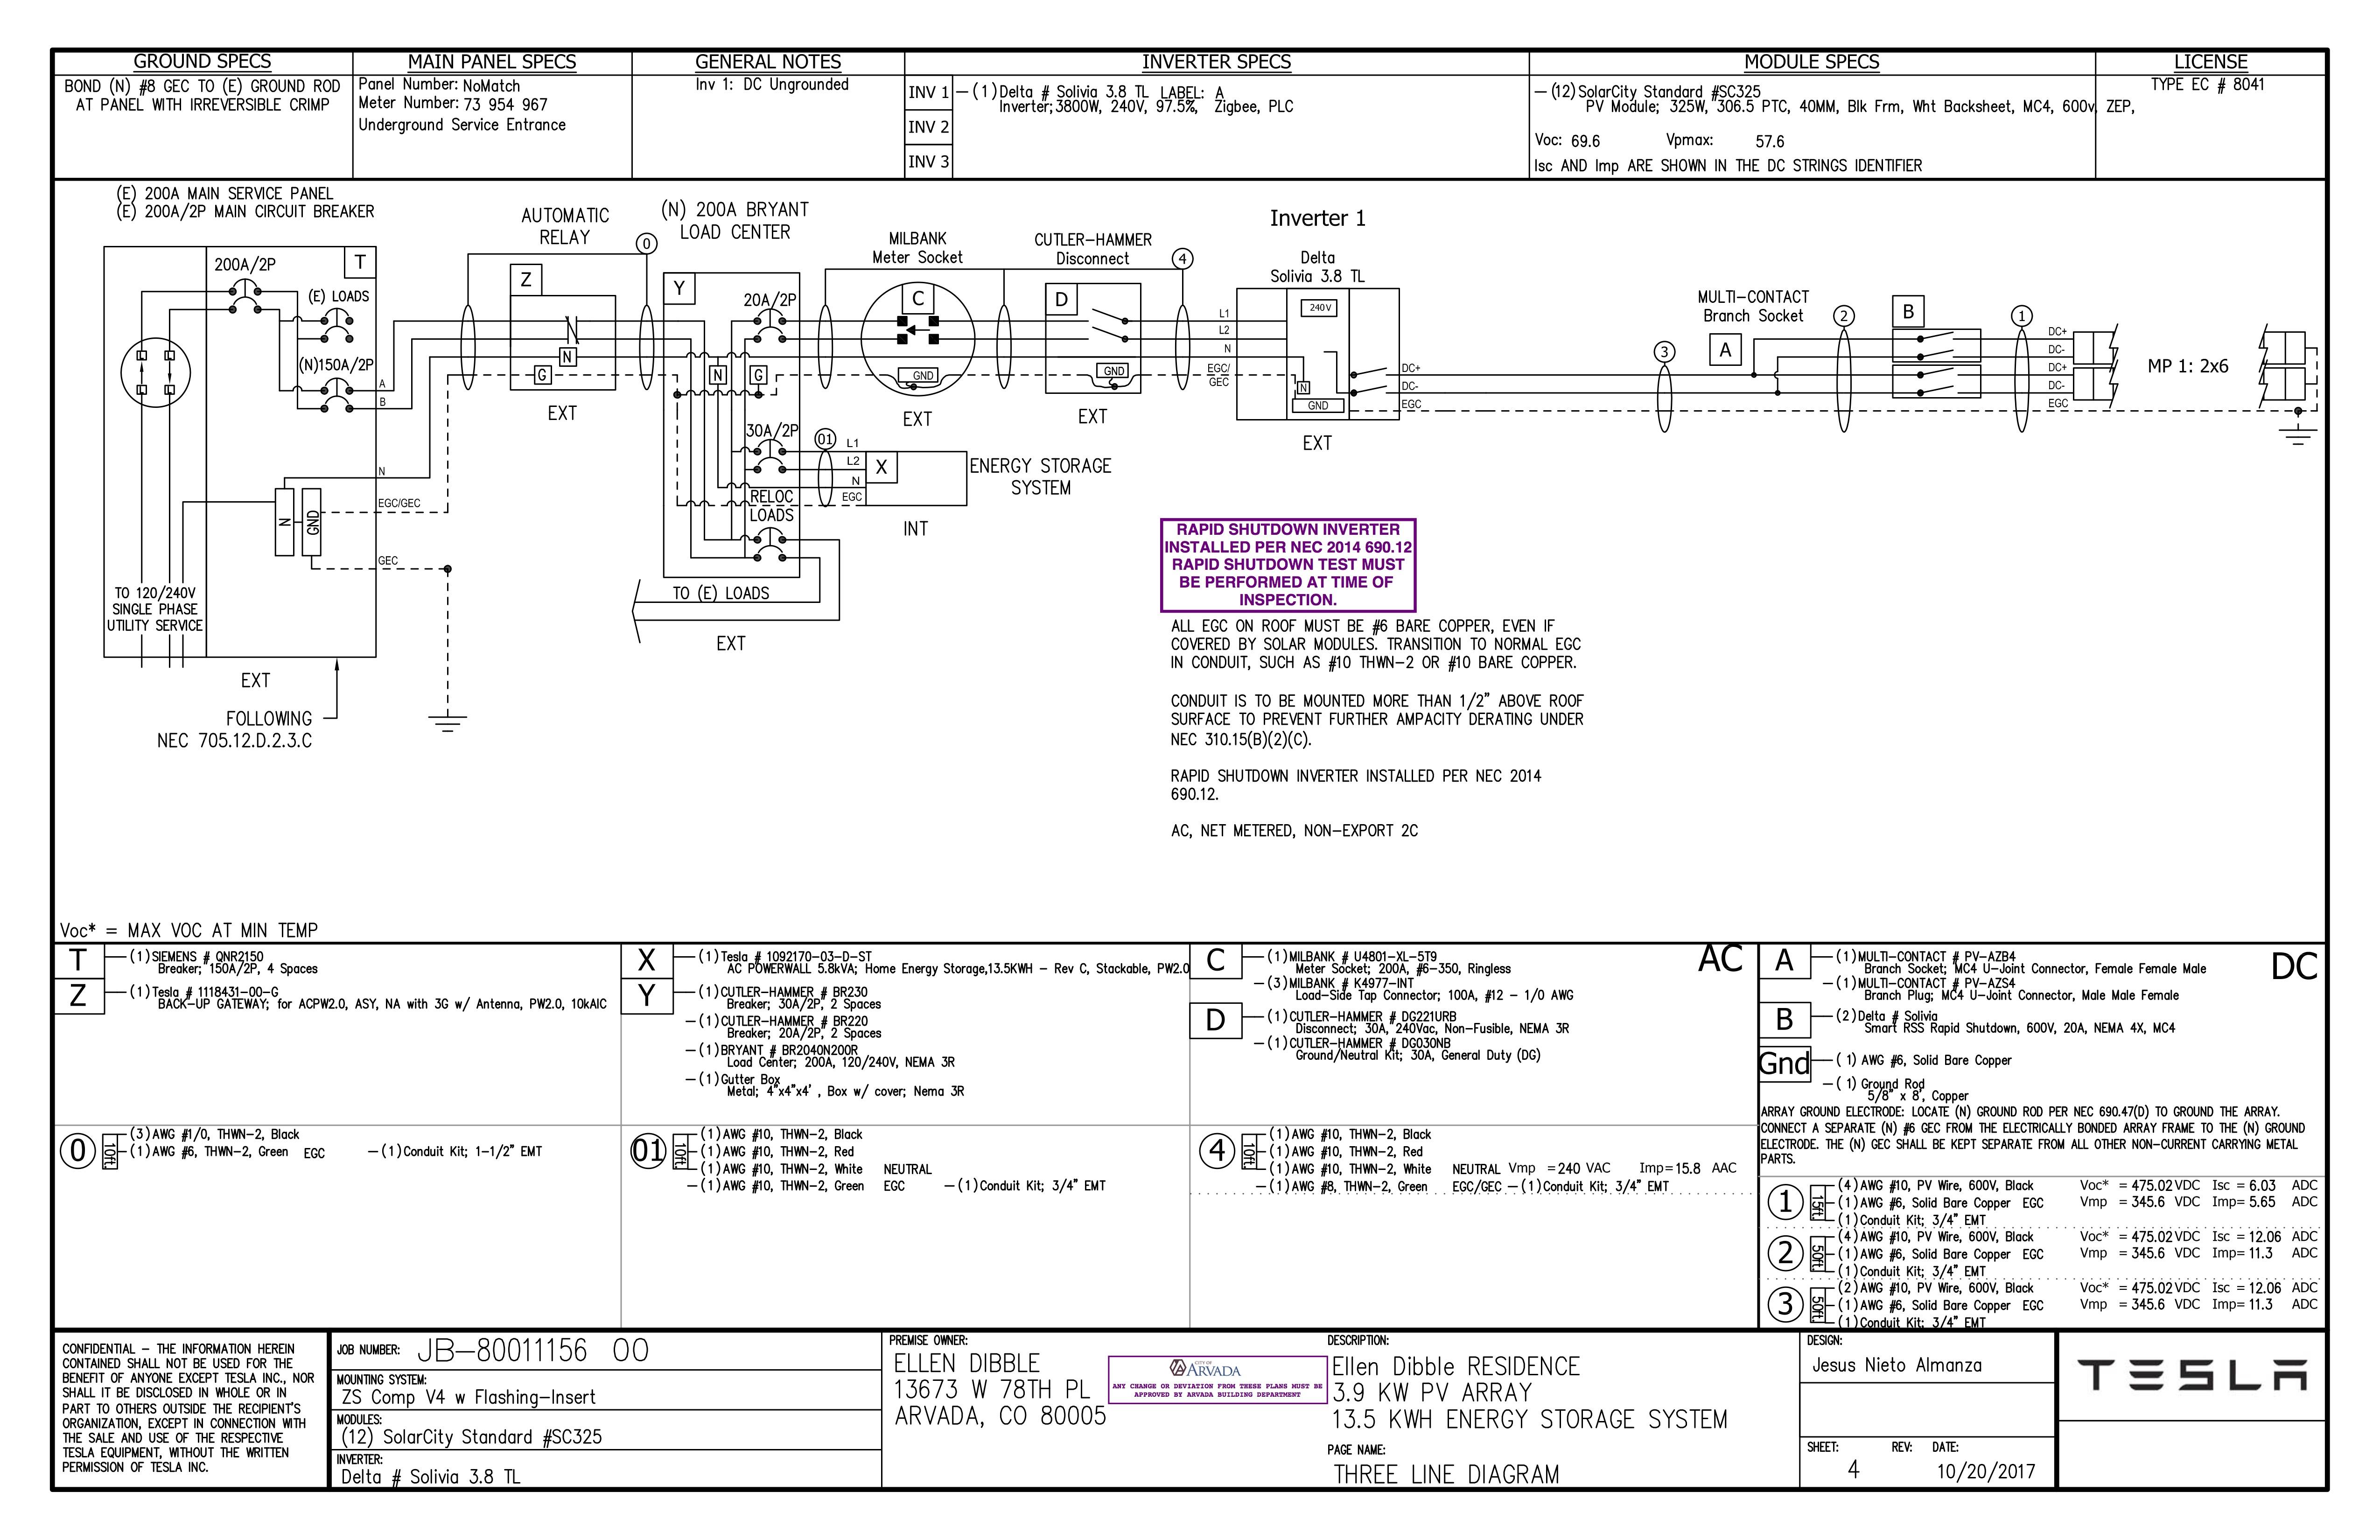 Tesla SOLAR PLAN Electrical Diagram